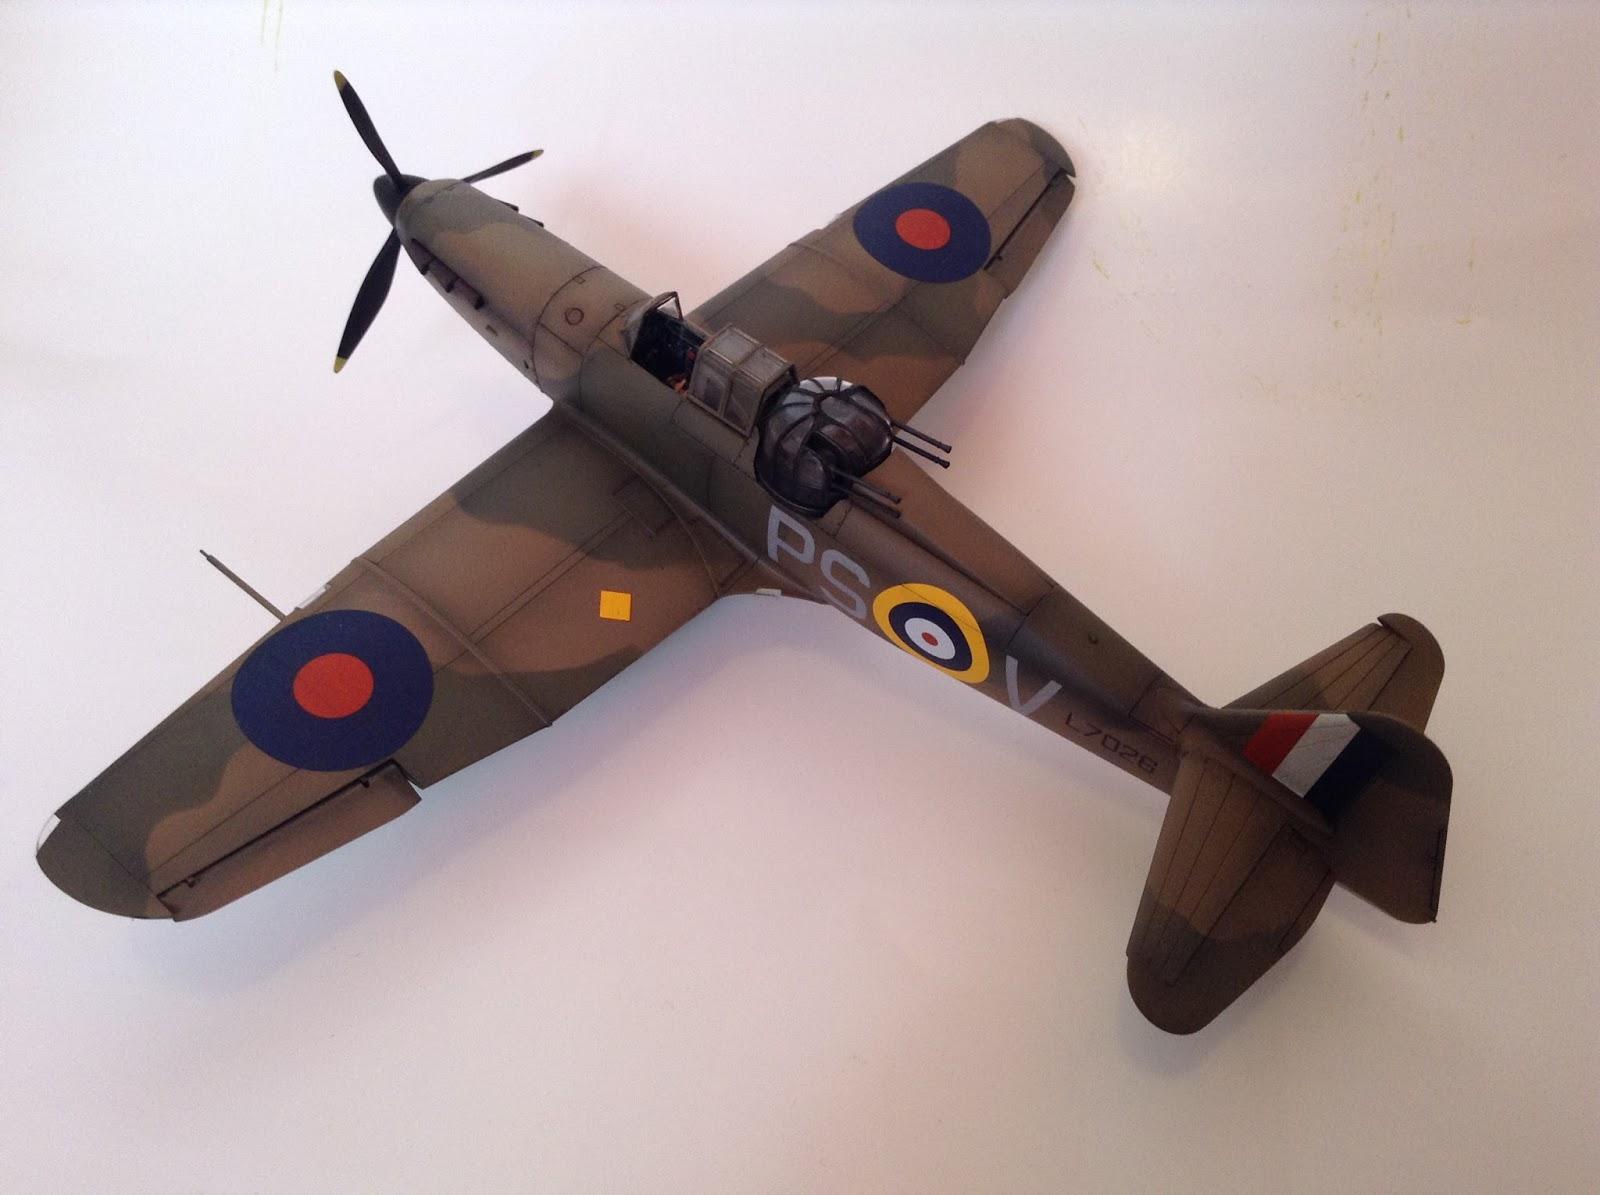 Airfix 1/48 Defiant - Ready for Inspection - Aircraft - Britmodeller com